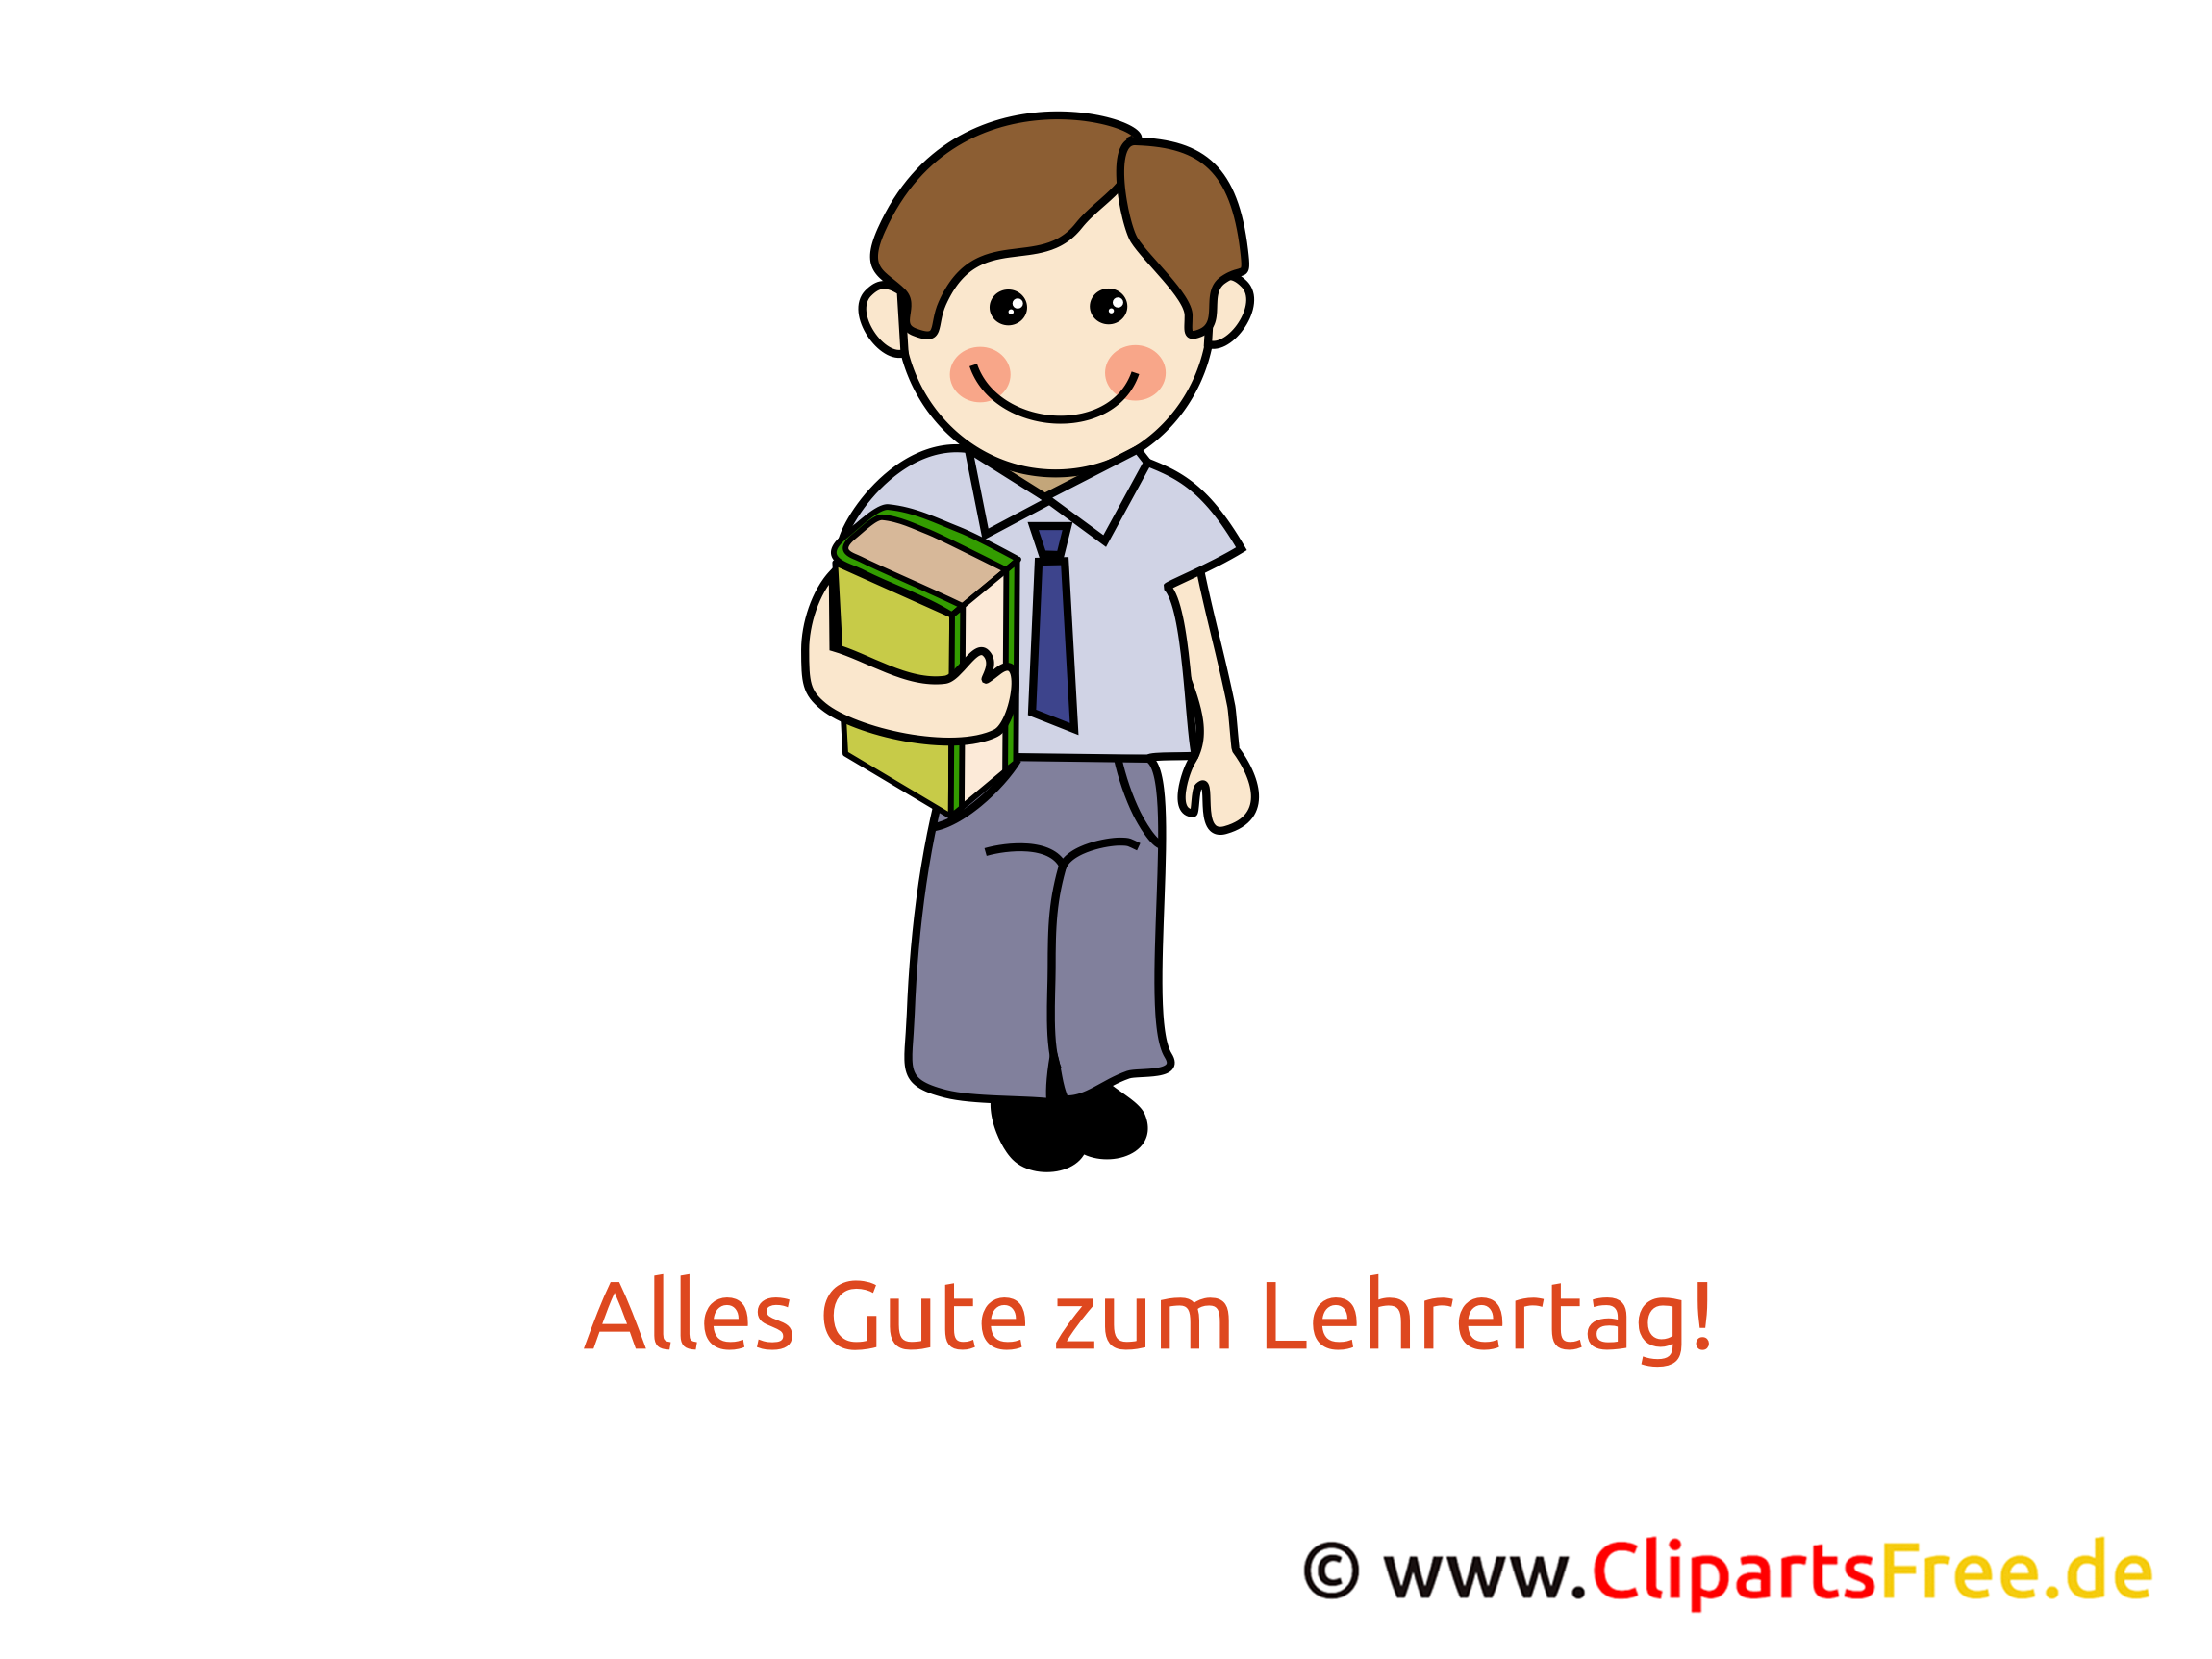 Welt Lehrer Tag Clipart, Bild, Grafik